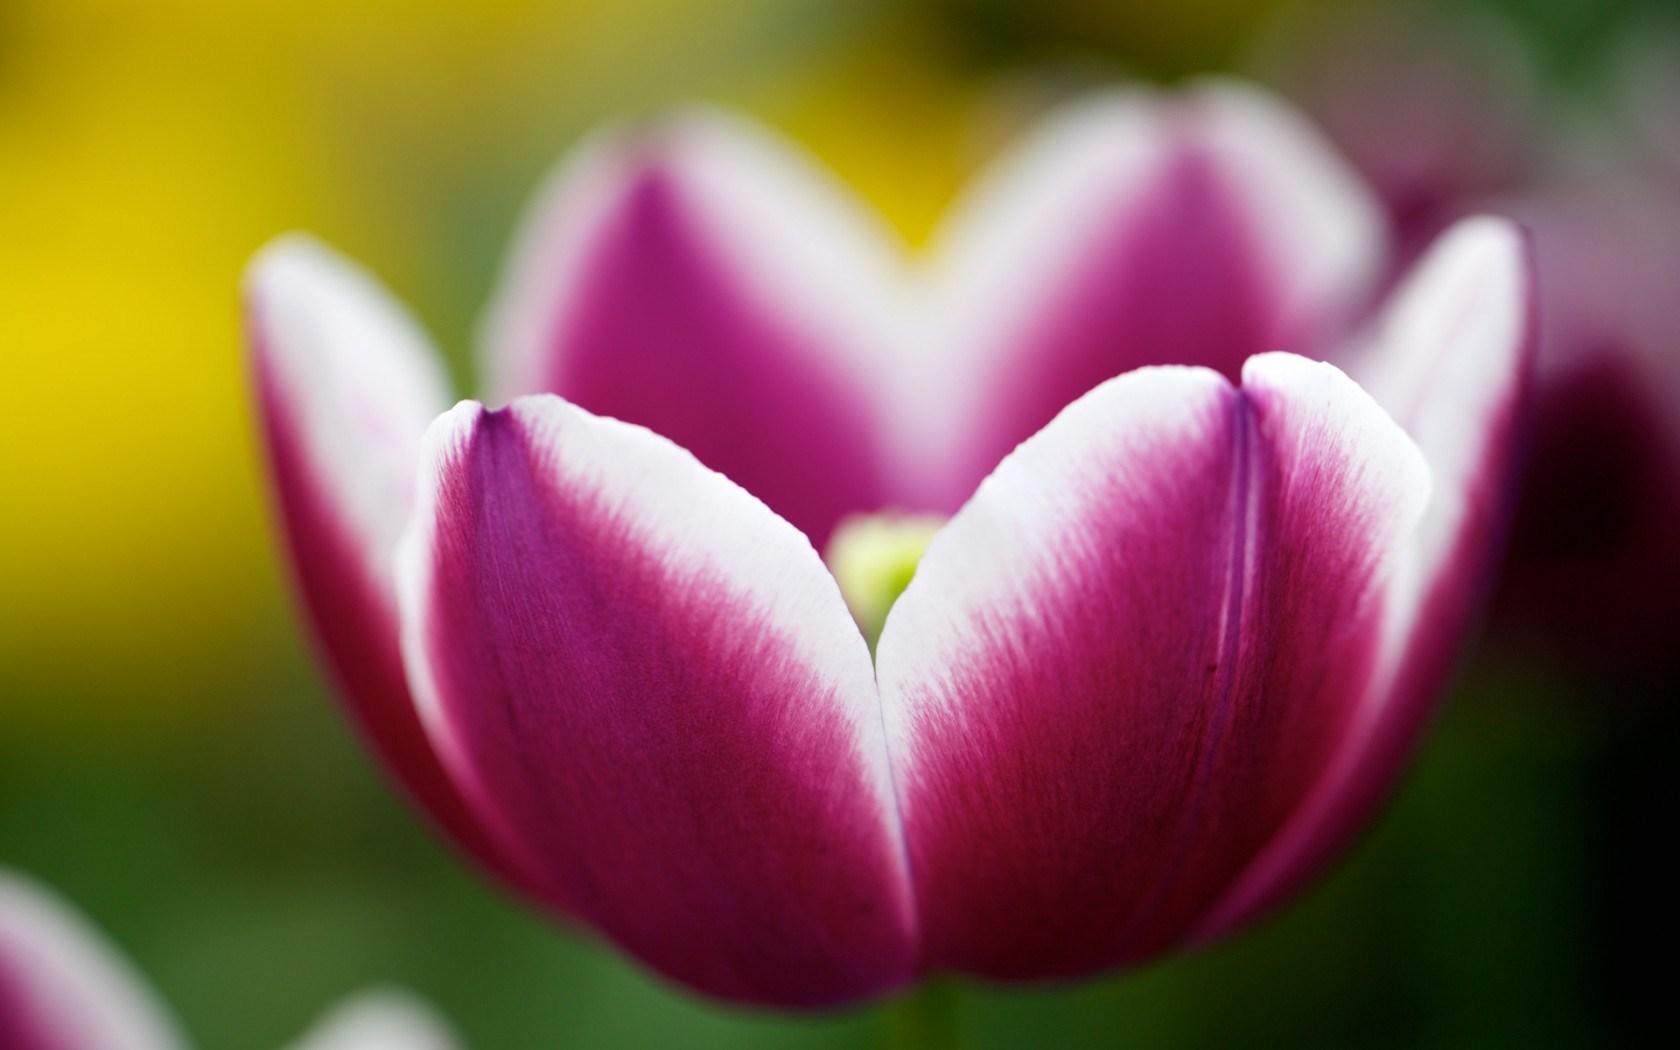 Flower Tulip Photo Close-Up